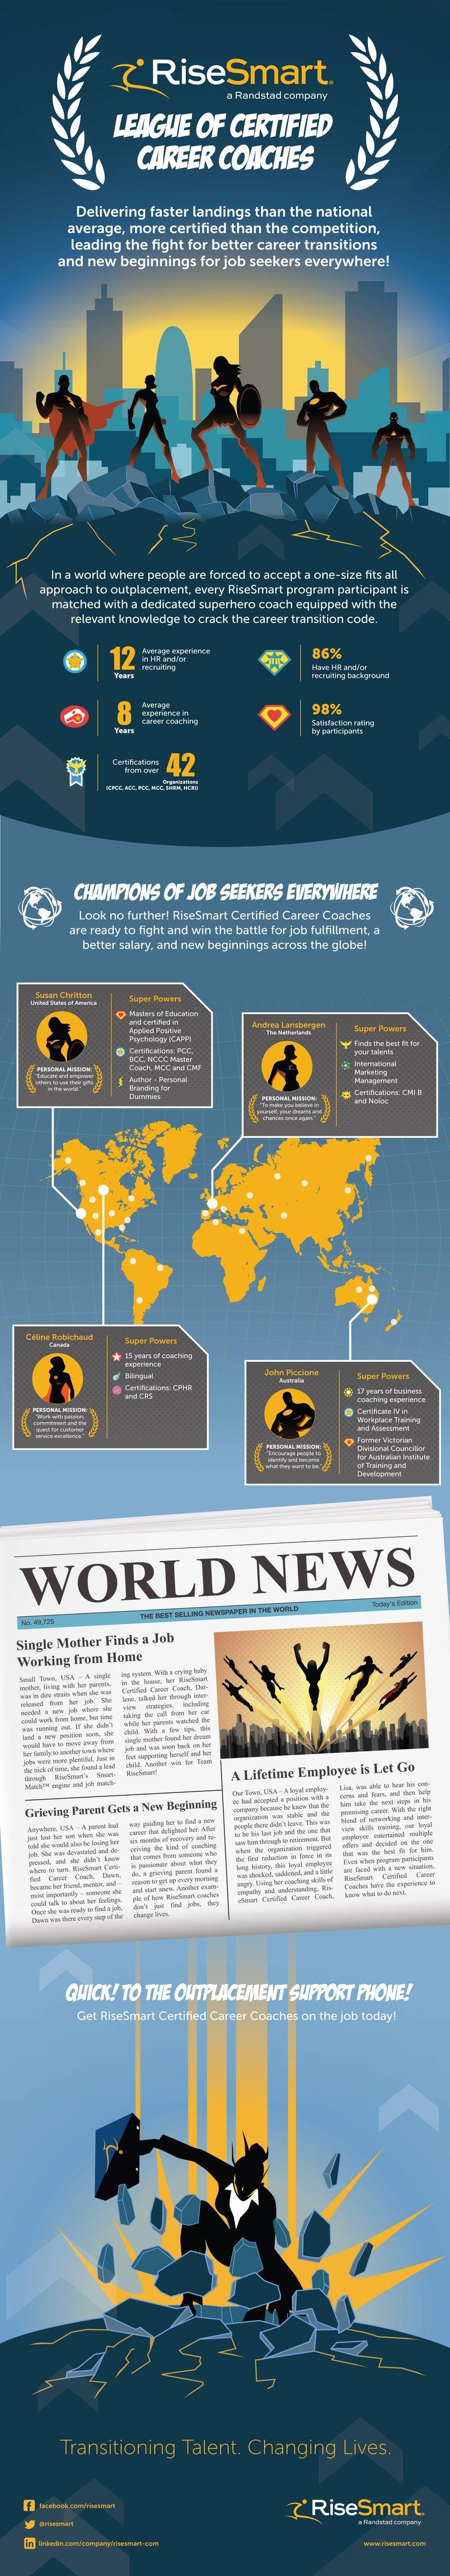 ig-coaching-infographic-120417-2.jpg